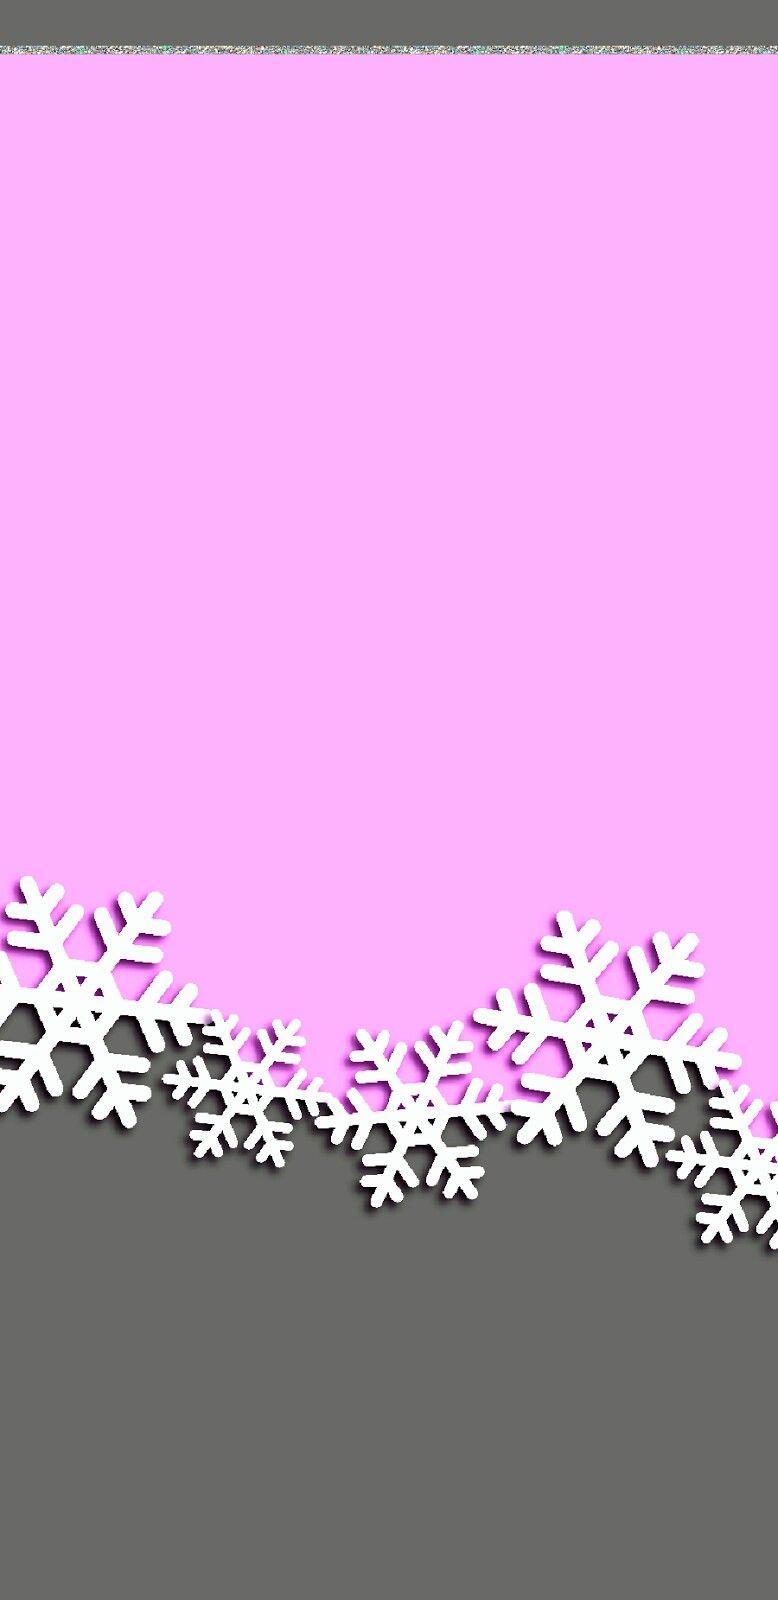 ♡NOTE8LOVE | Winter/Invierno | Pinterest | Fondos, Marcos para foto ...